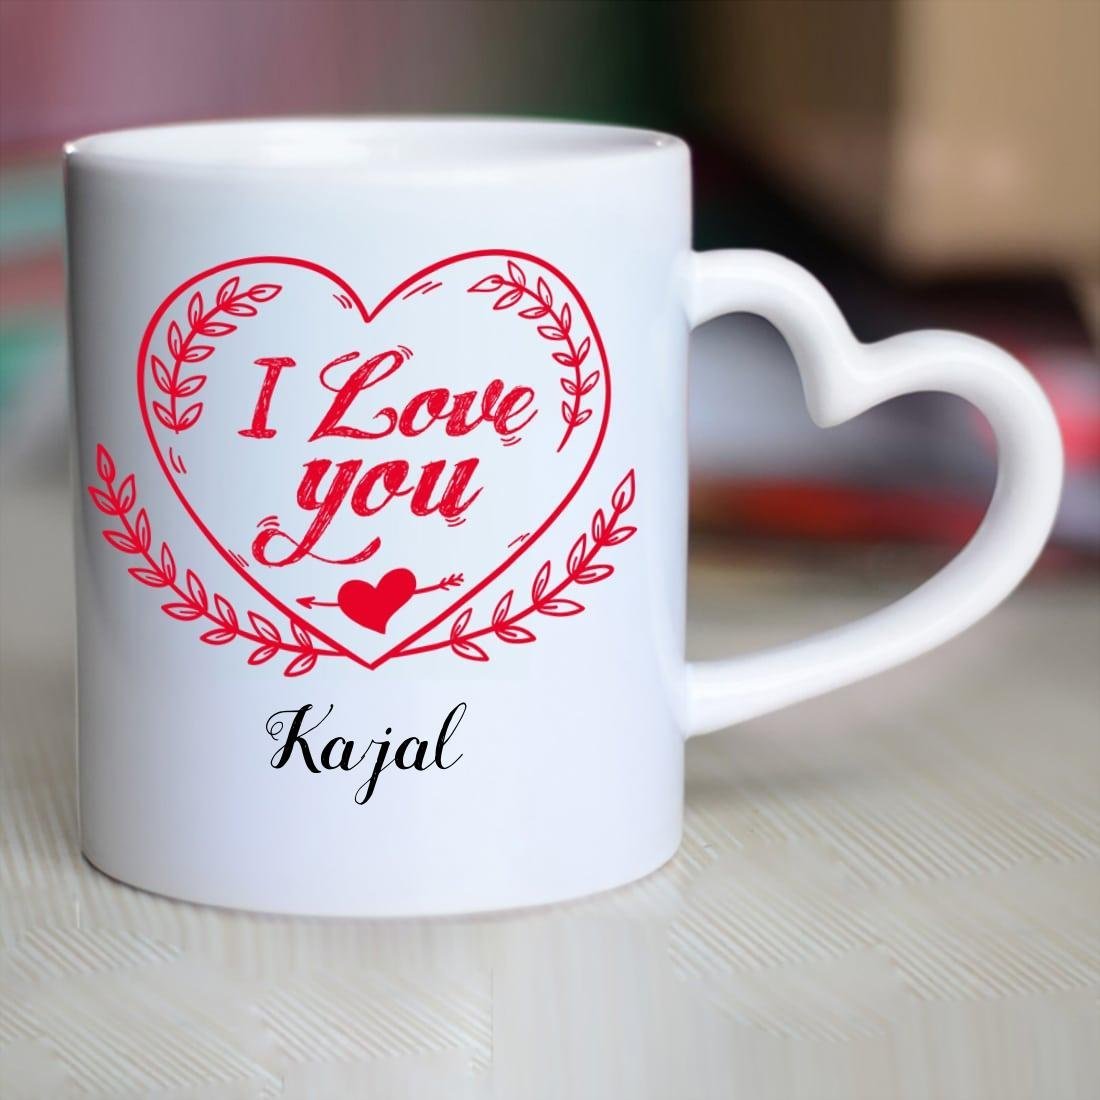 Buy Huppme I Love You Kajal Heart Handle Mug 350 Ml White Online At Low Prices In India Amazon In Kajal i love u, mumbai, india. buy huppme i love you kajal heart